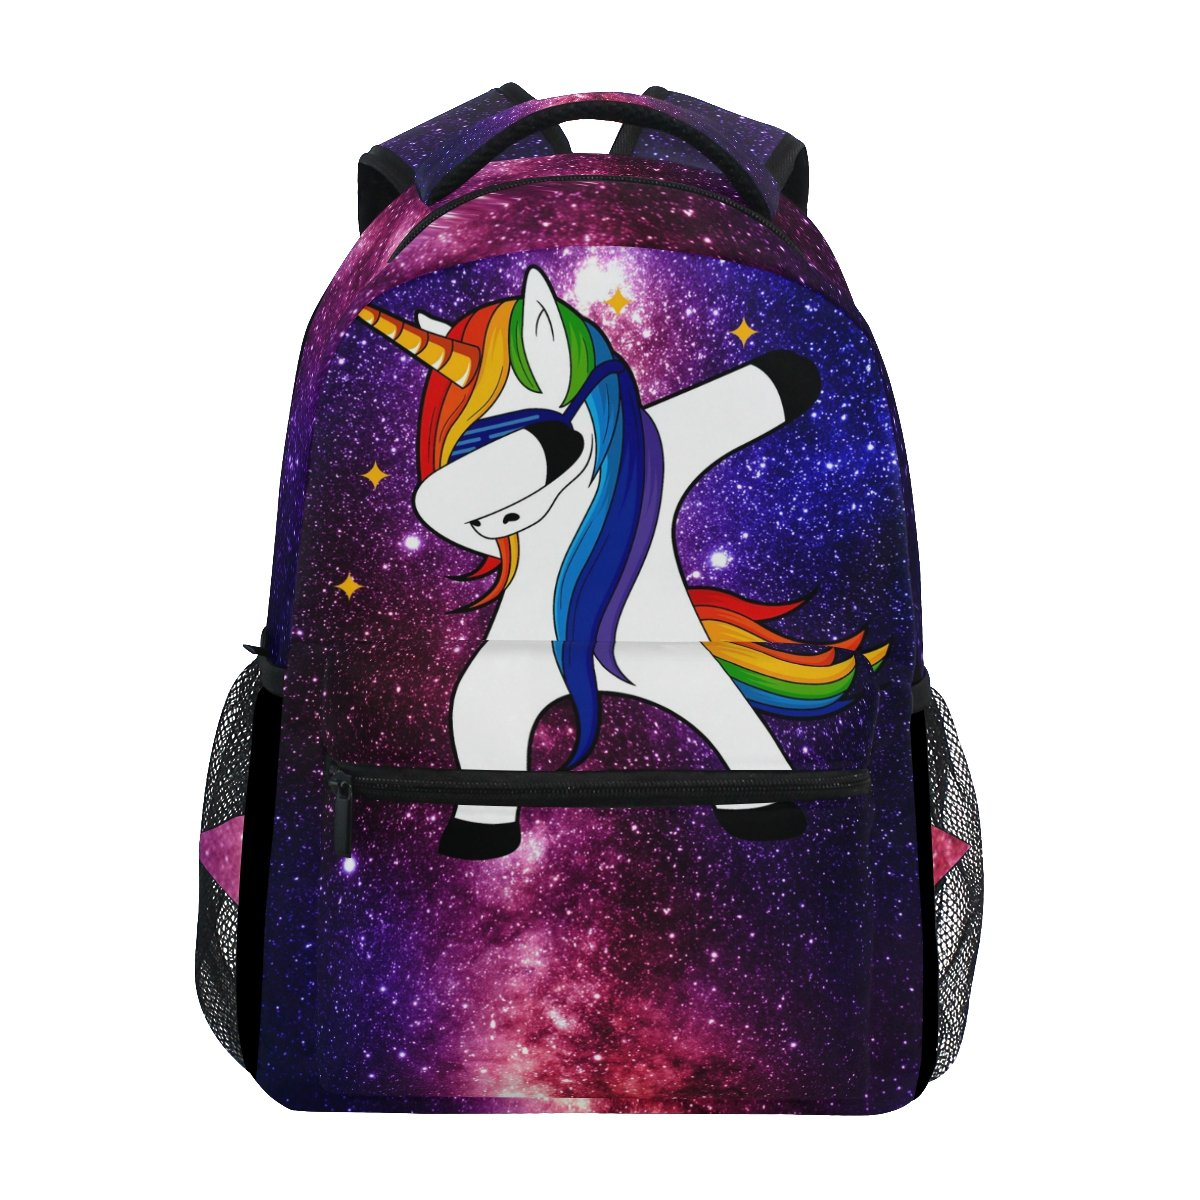 Zzkko Space Galaxy Animal Licorne Sacs à Dos College School Book Sac de Voyage randonnée Camping Sac à Dos 5003167p203c237s337